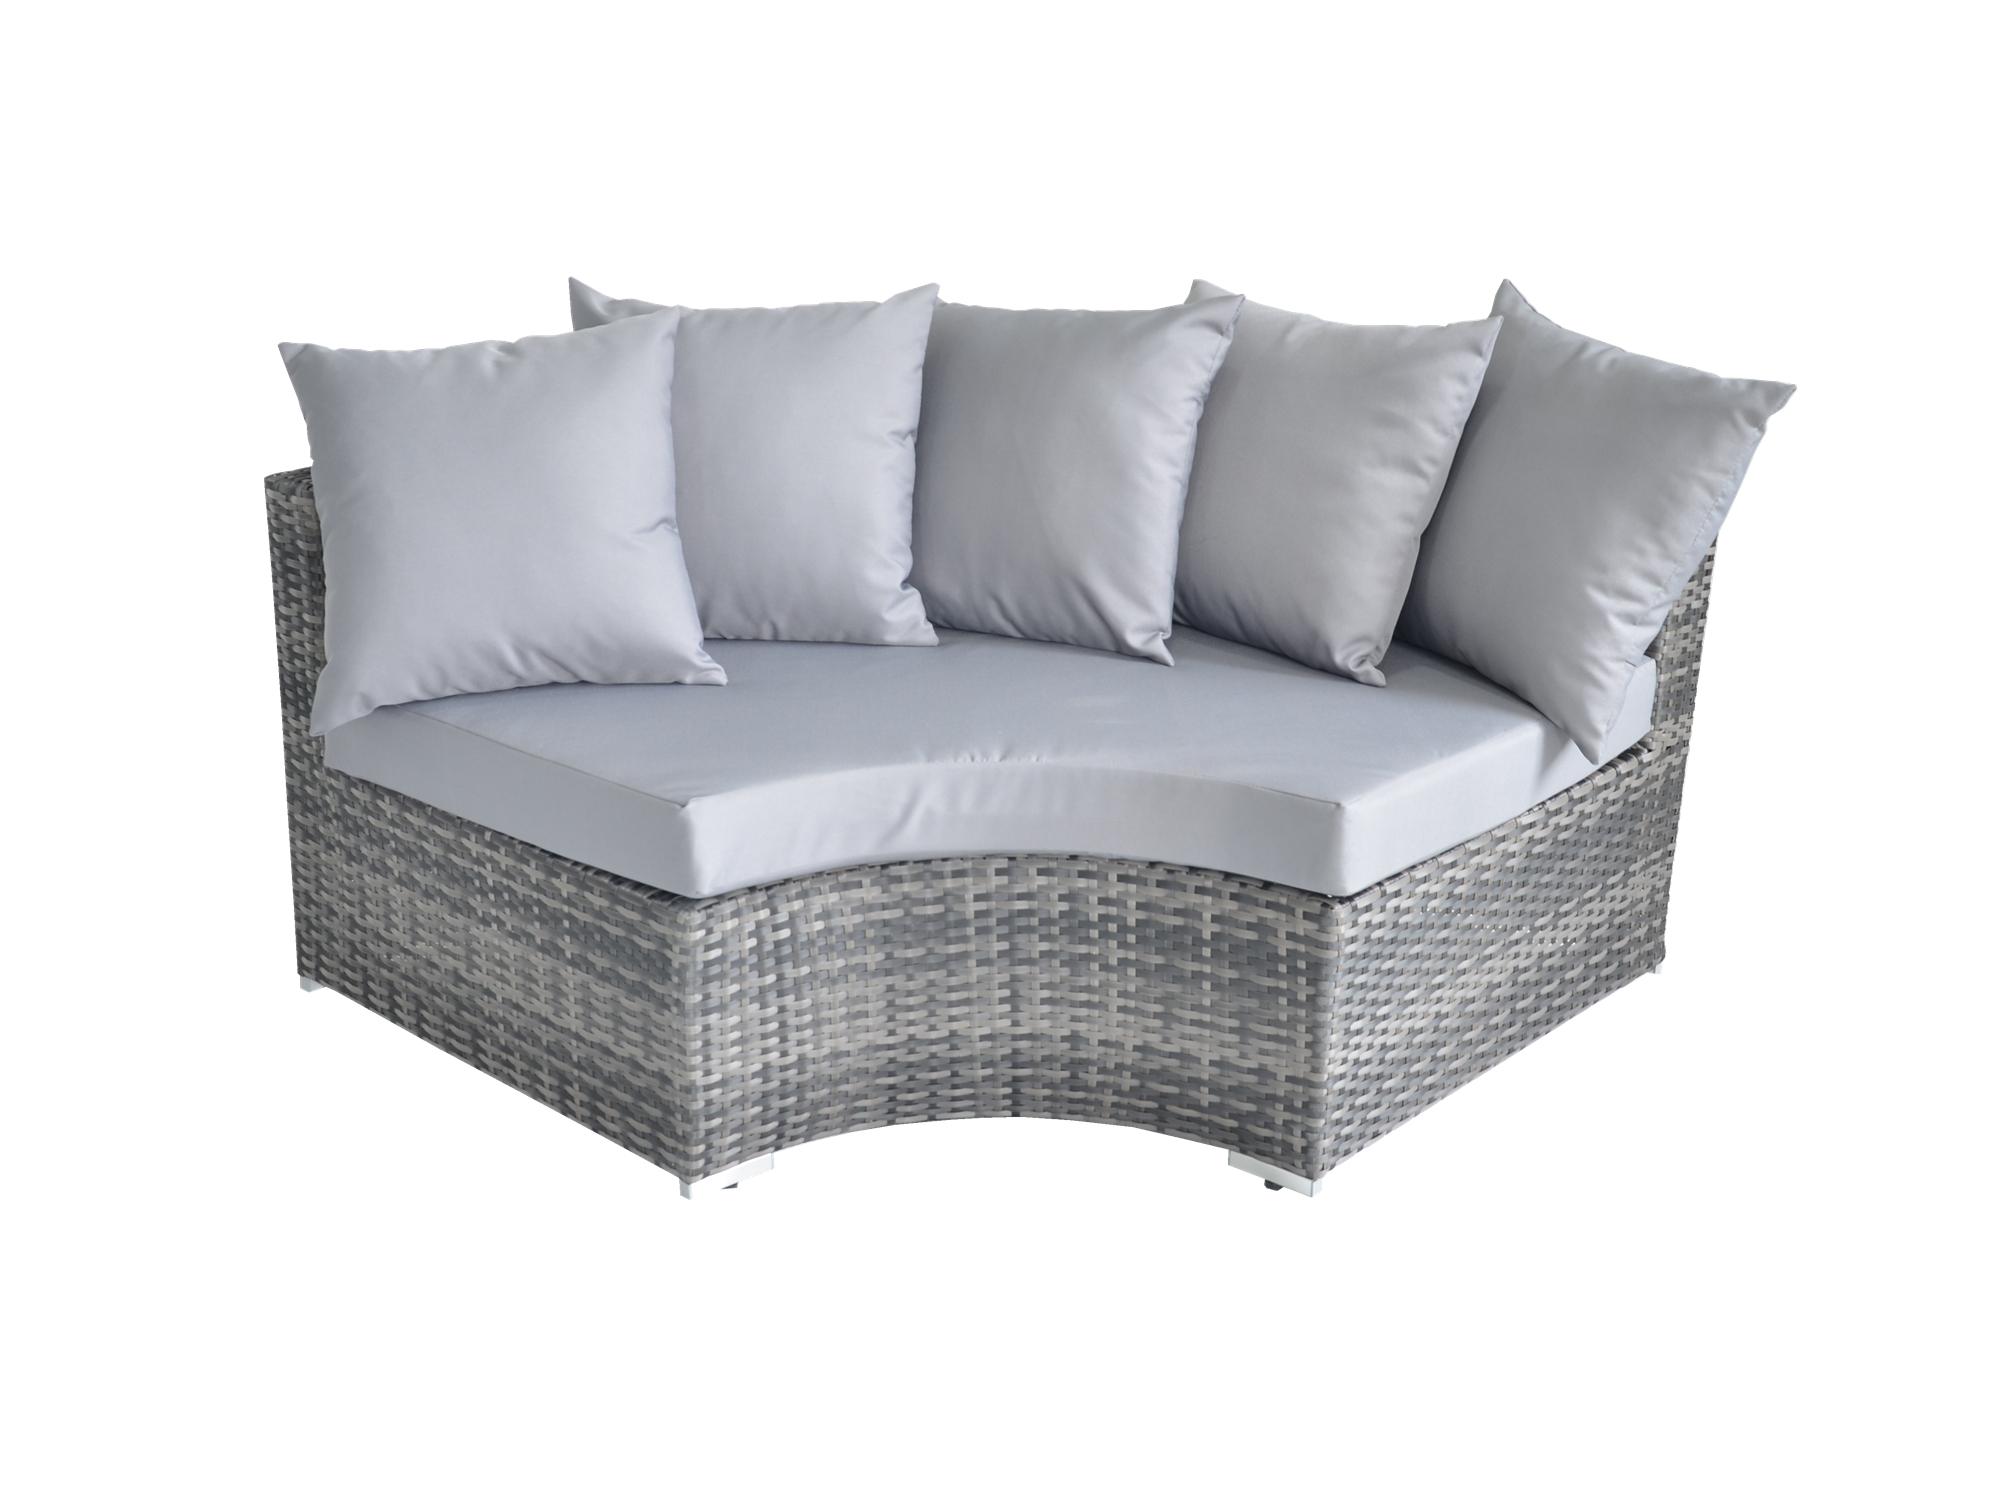 Rattan Fairy Valencia 5 PieceDeluxe Garden Furniture Set With Grey colour cushions